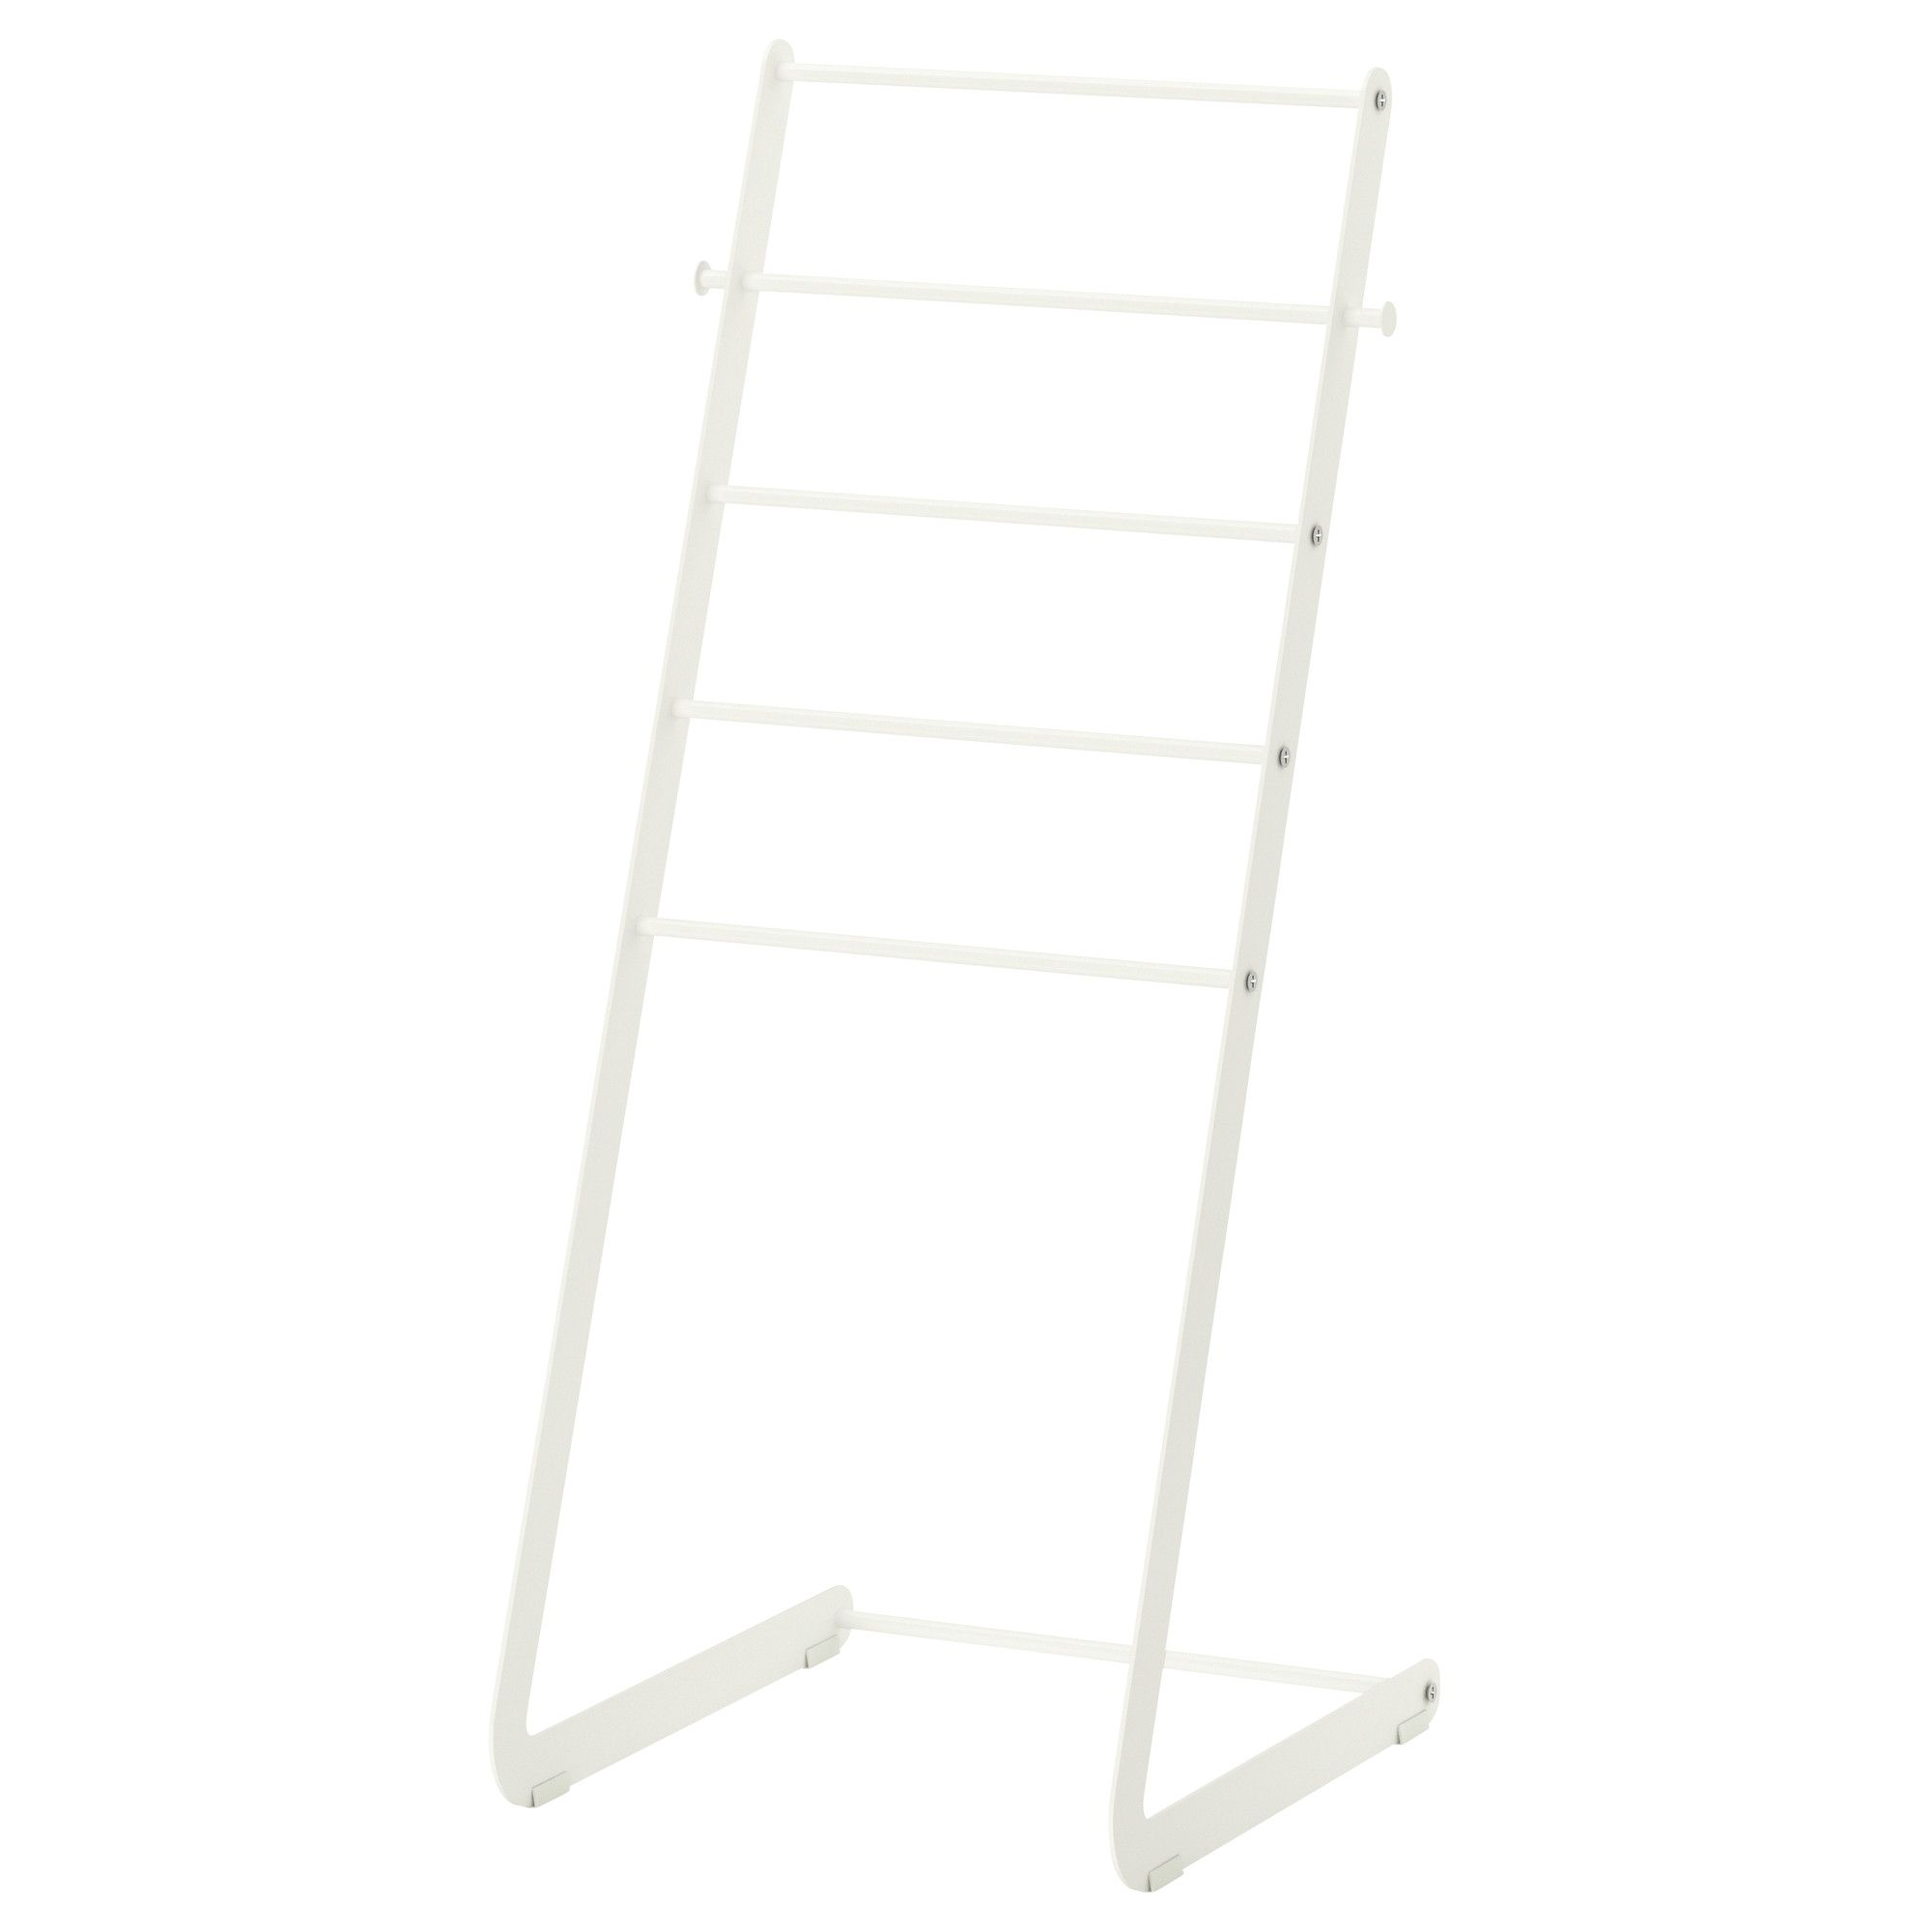 ENUDDEN Towel stand - IKEA